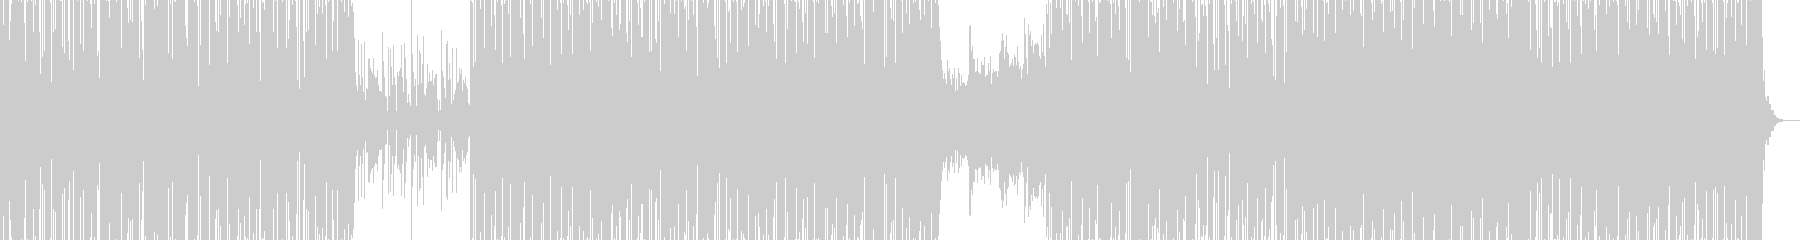 Ashesanddreams Remixの未再生の波形